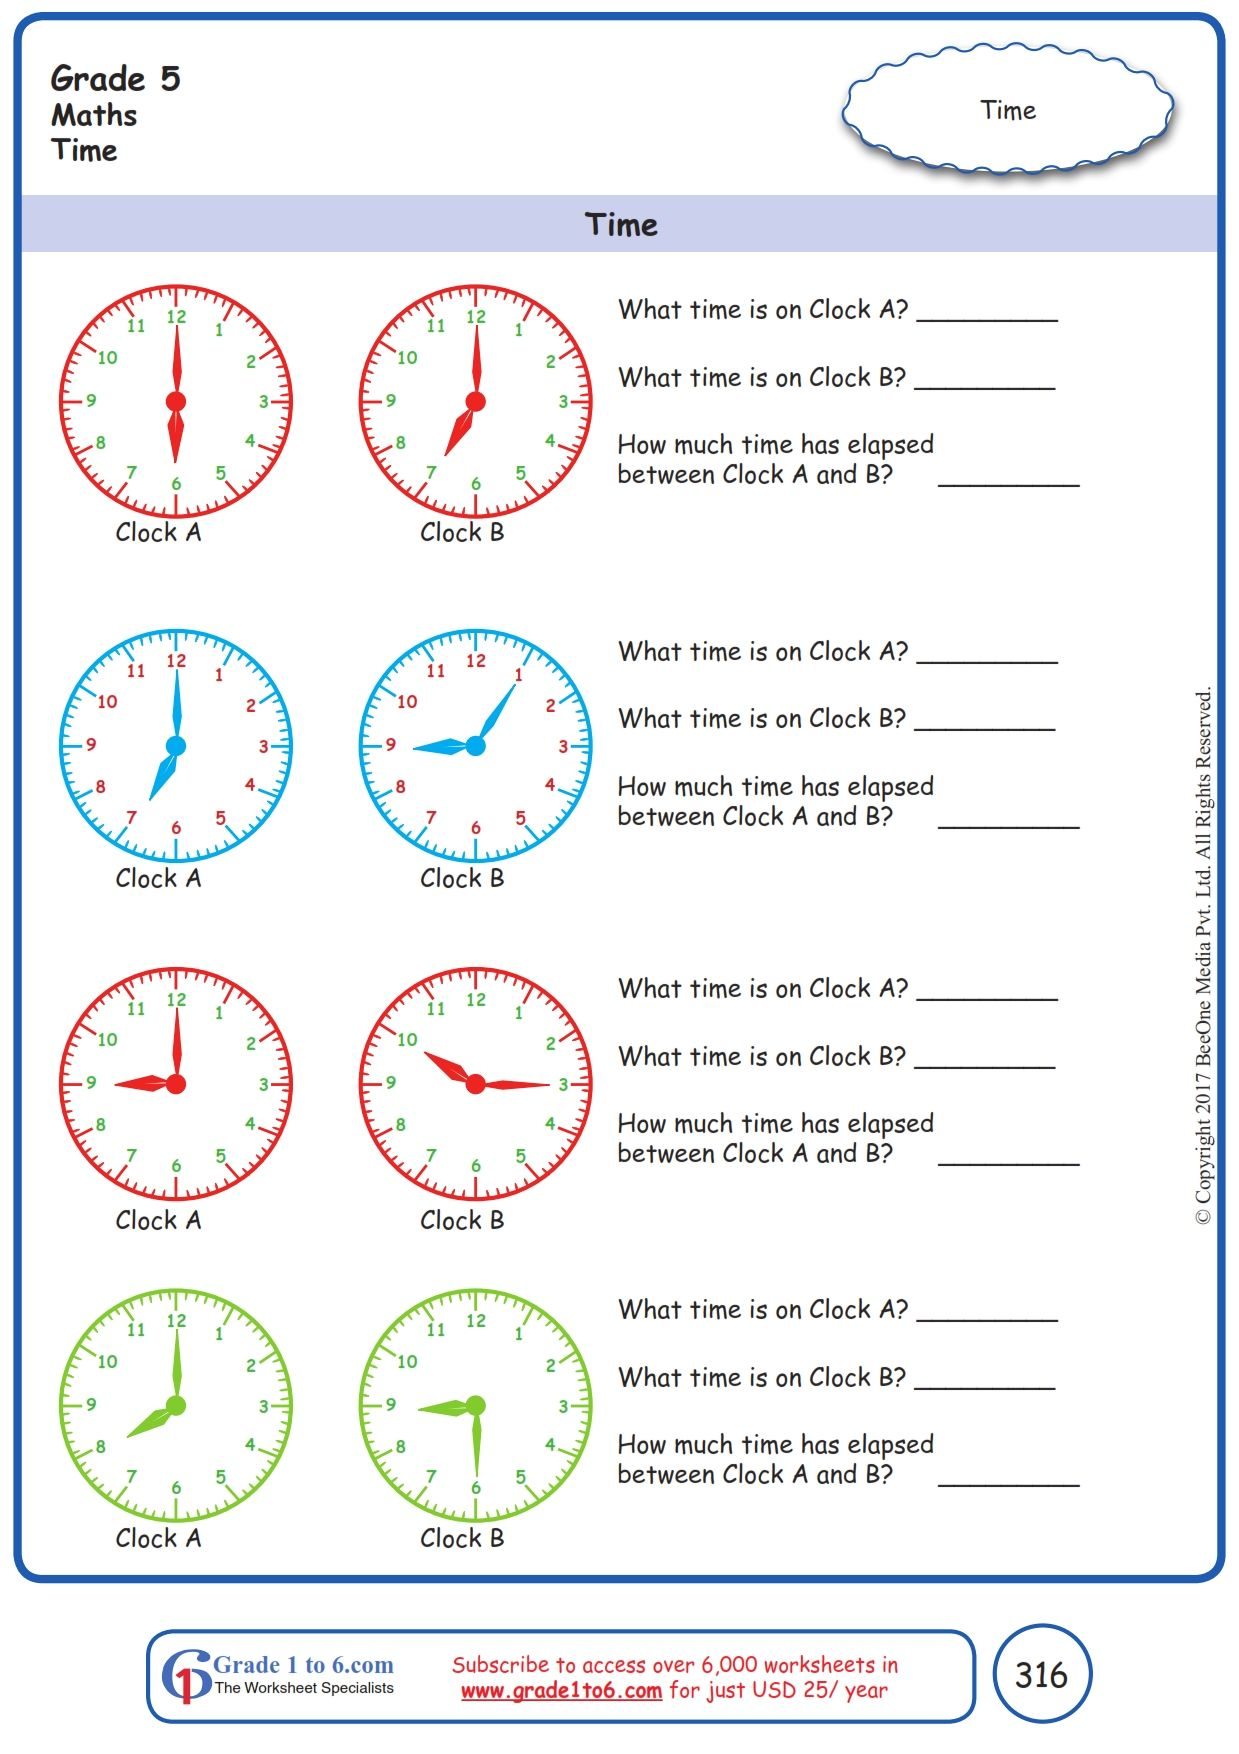 Worksheet Grade 5 Math Time in 2021   Kindergarten worksheets [ 1754 x 1239 Pixel ]